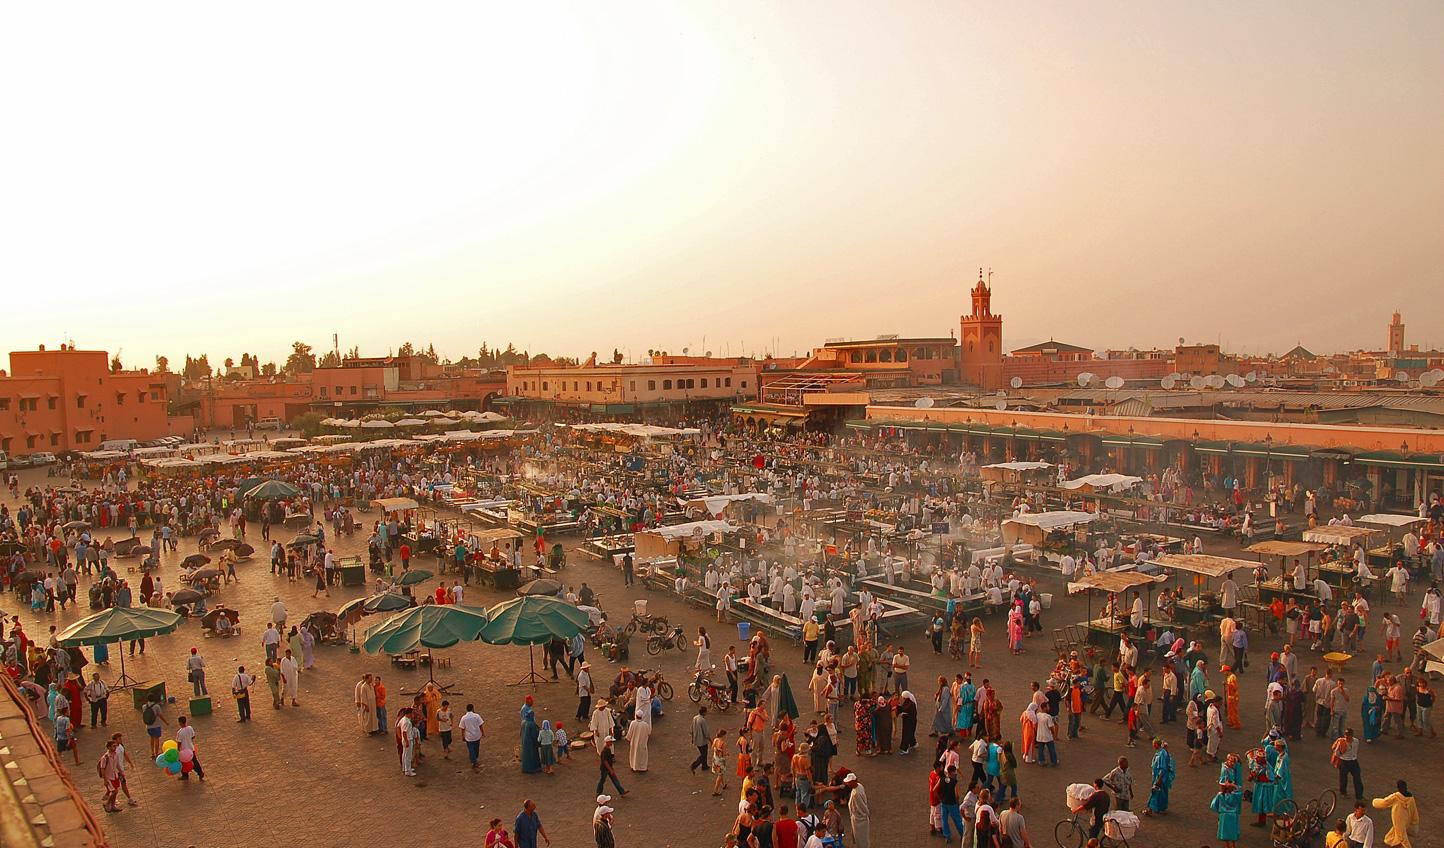 Kickstart your trip amid the bustle of Jemaa el Fna in Marrakech